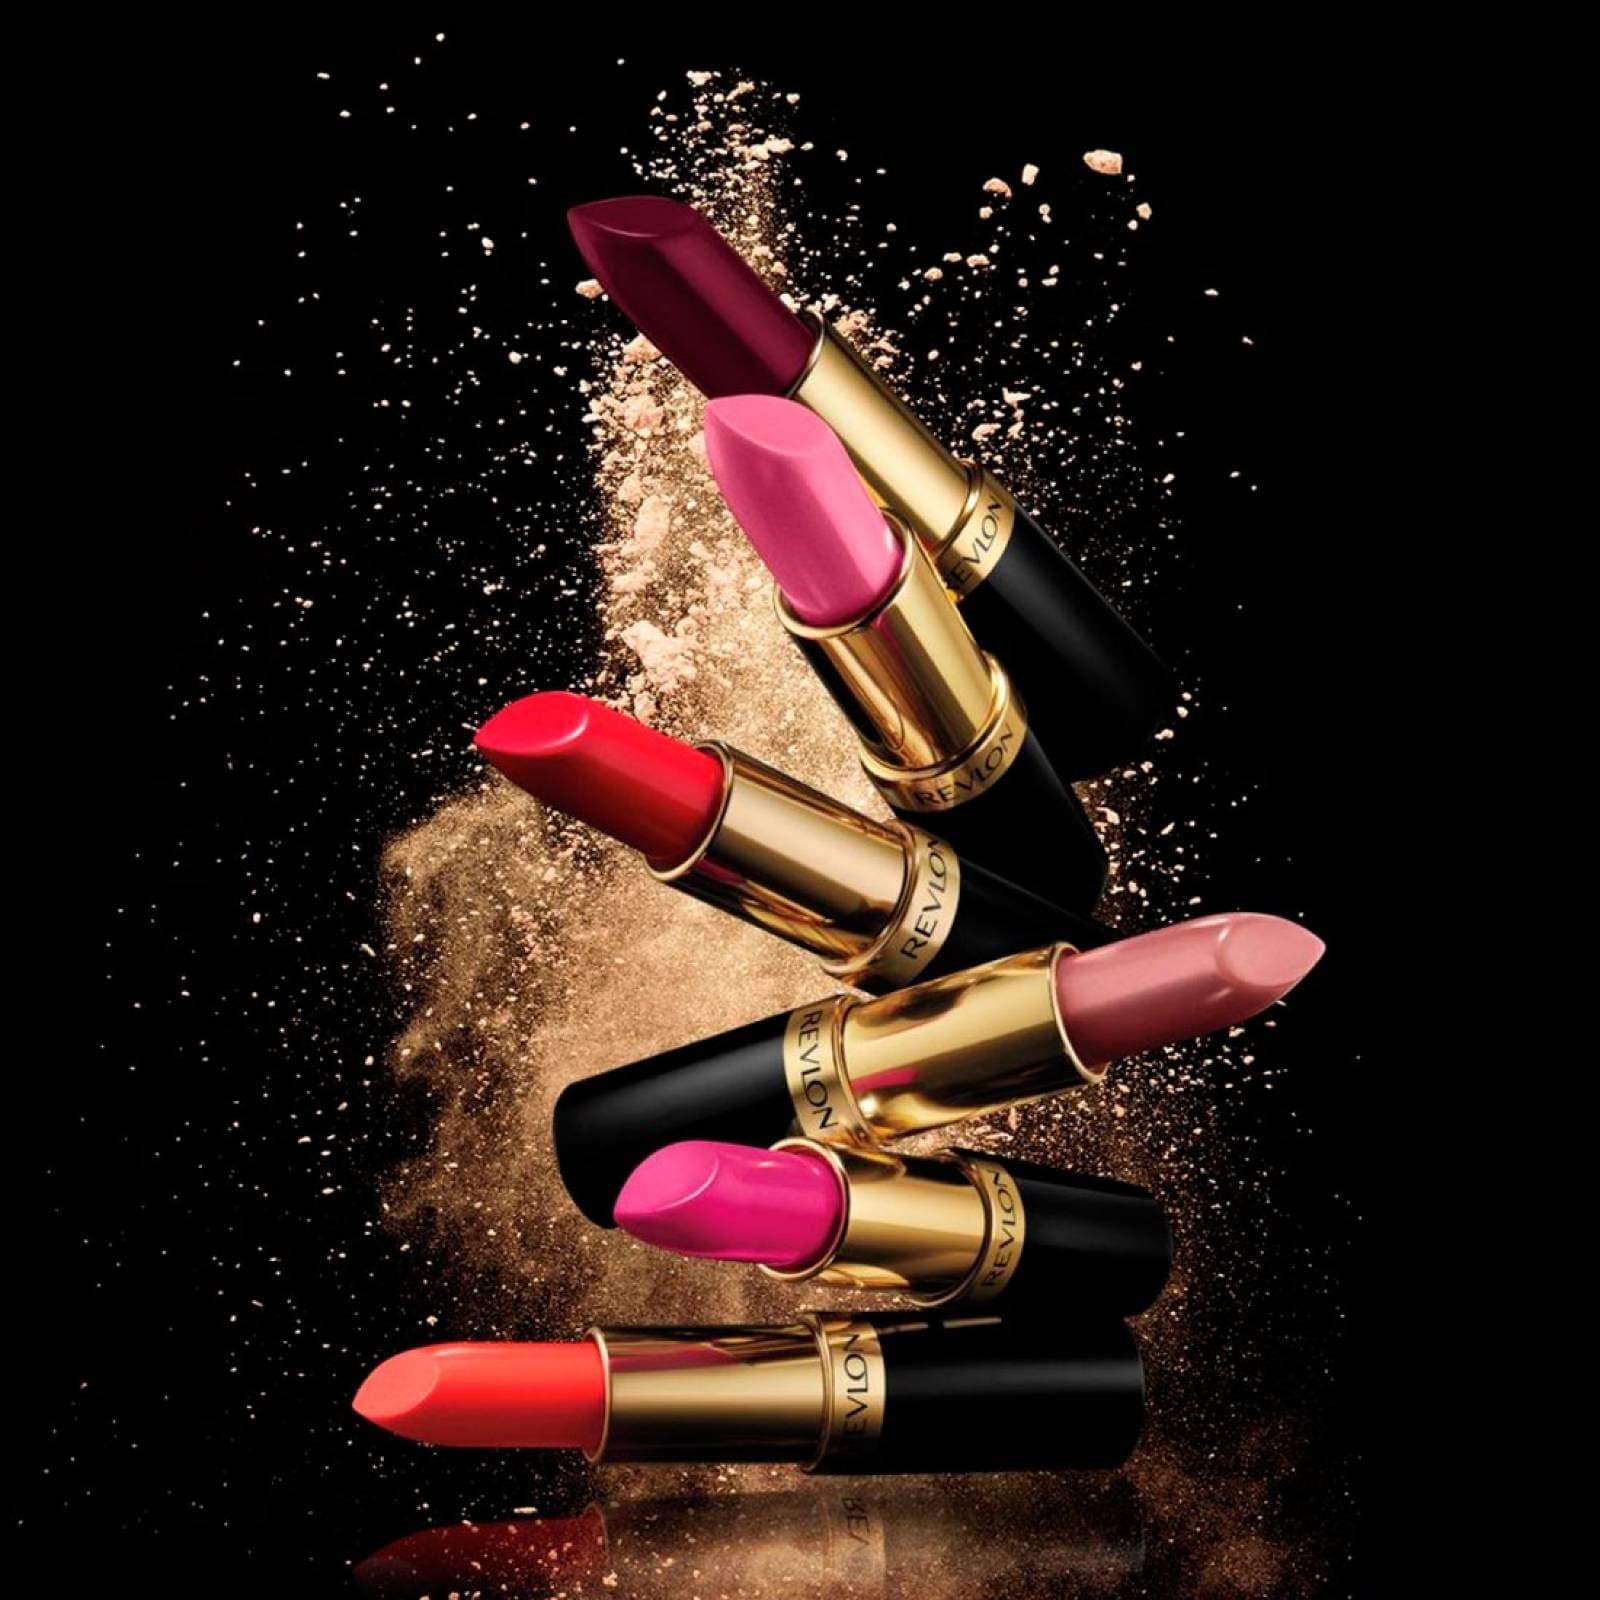 Labiales Acabado Brillante Superlustrous ColorIntenso Revlon Rich Girl Red